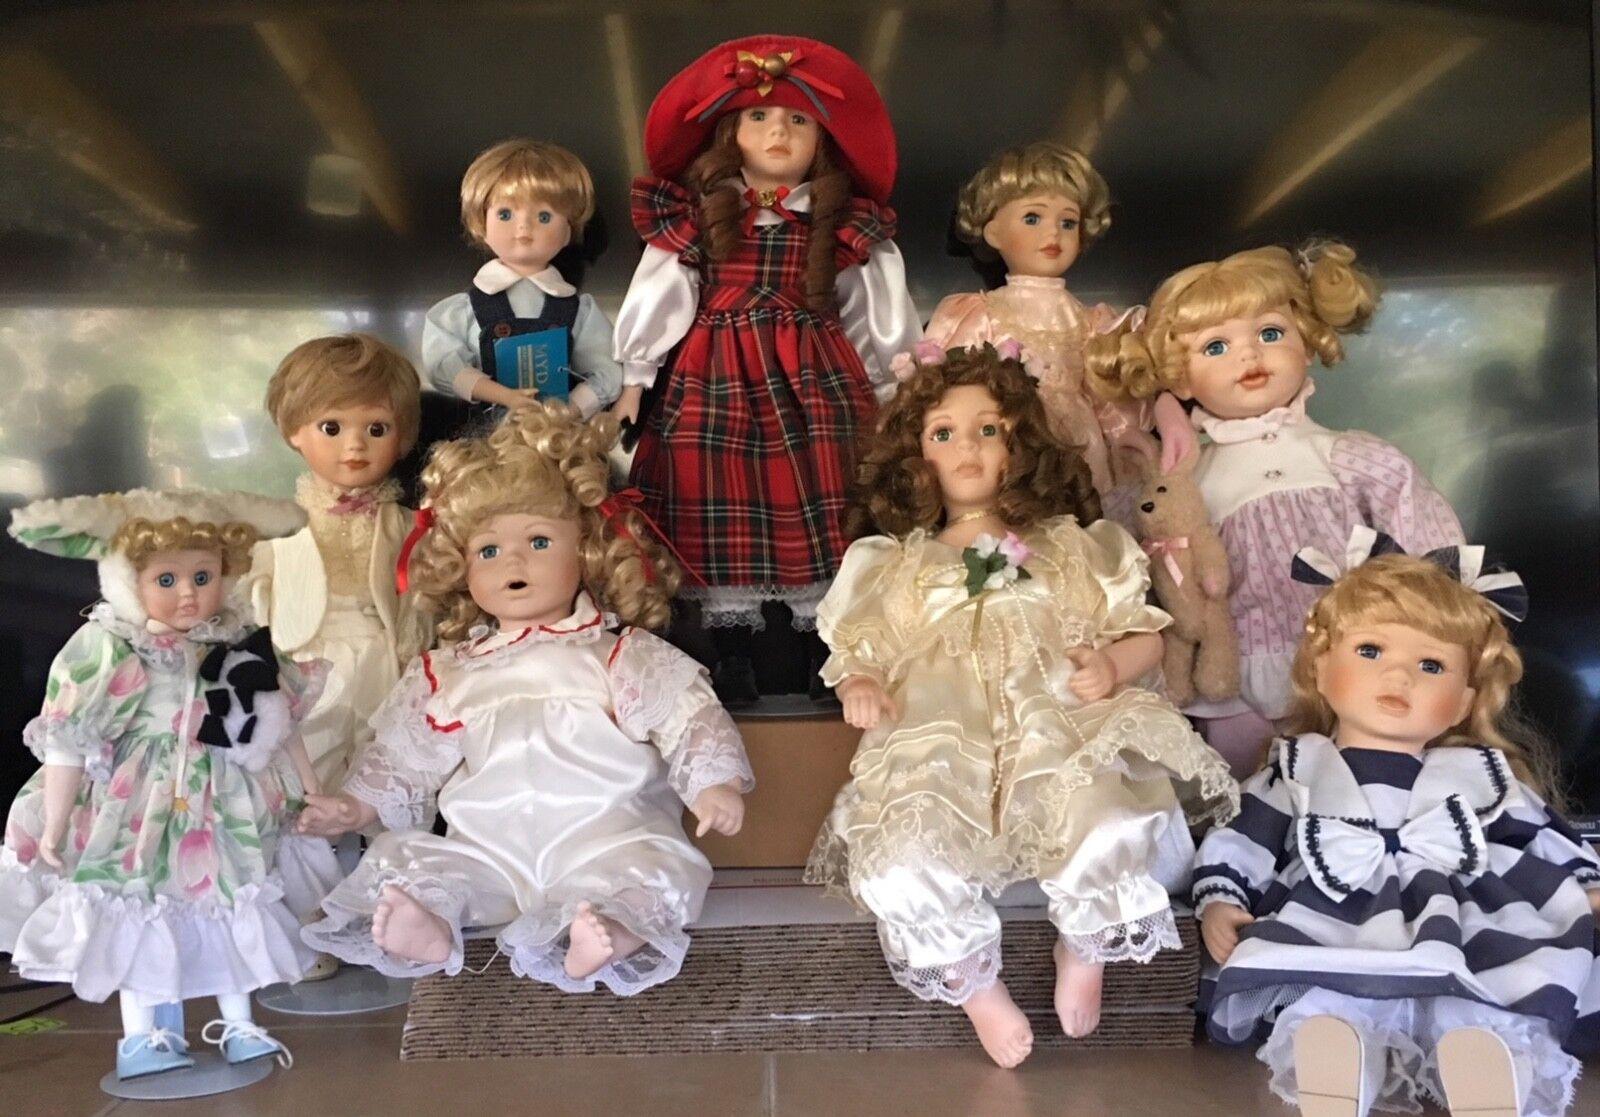 Lote de 9 muñecas de porcelana mezcla total Marian Yu Niño Niña Varios Tamaños Soporte Etiqueta agradable